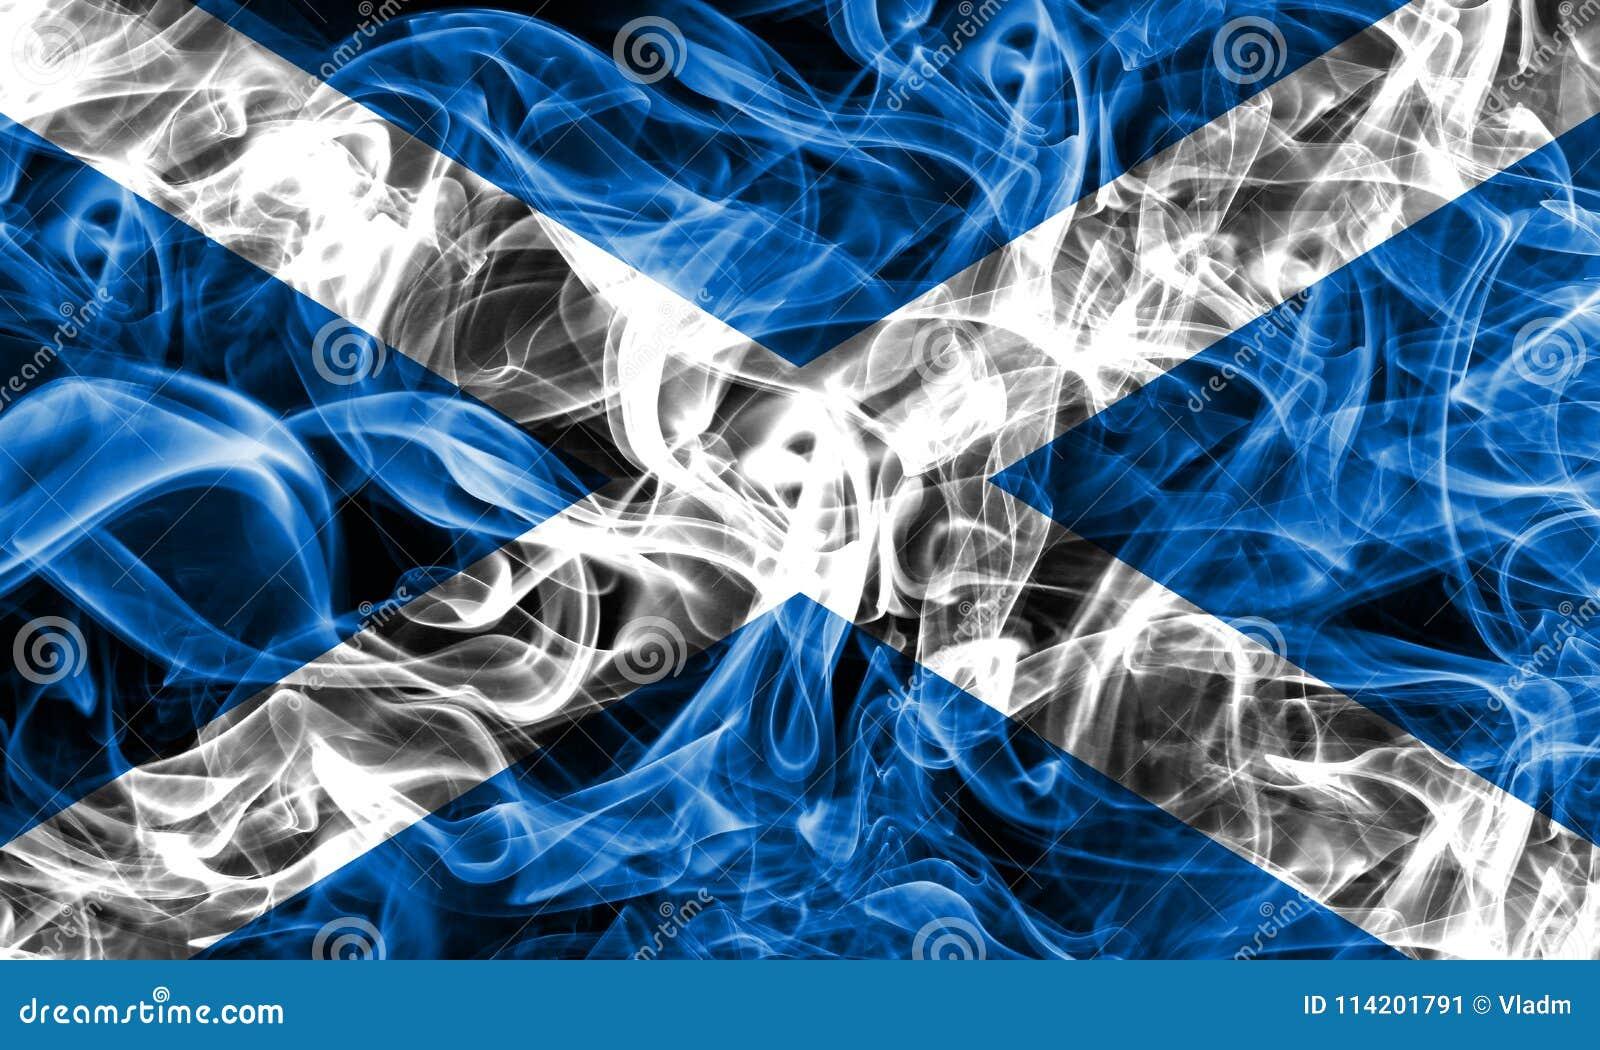 Scotland smoke flag on a black background